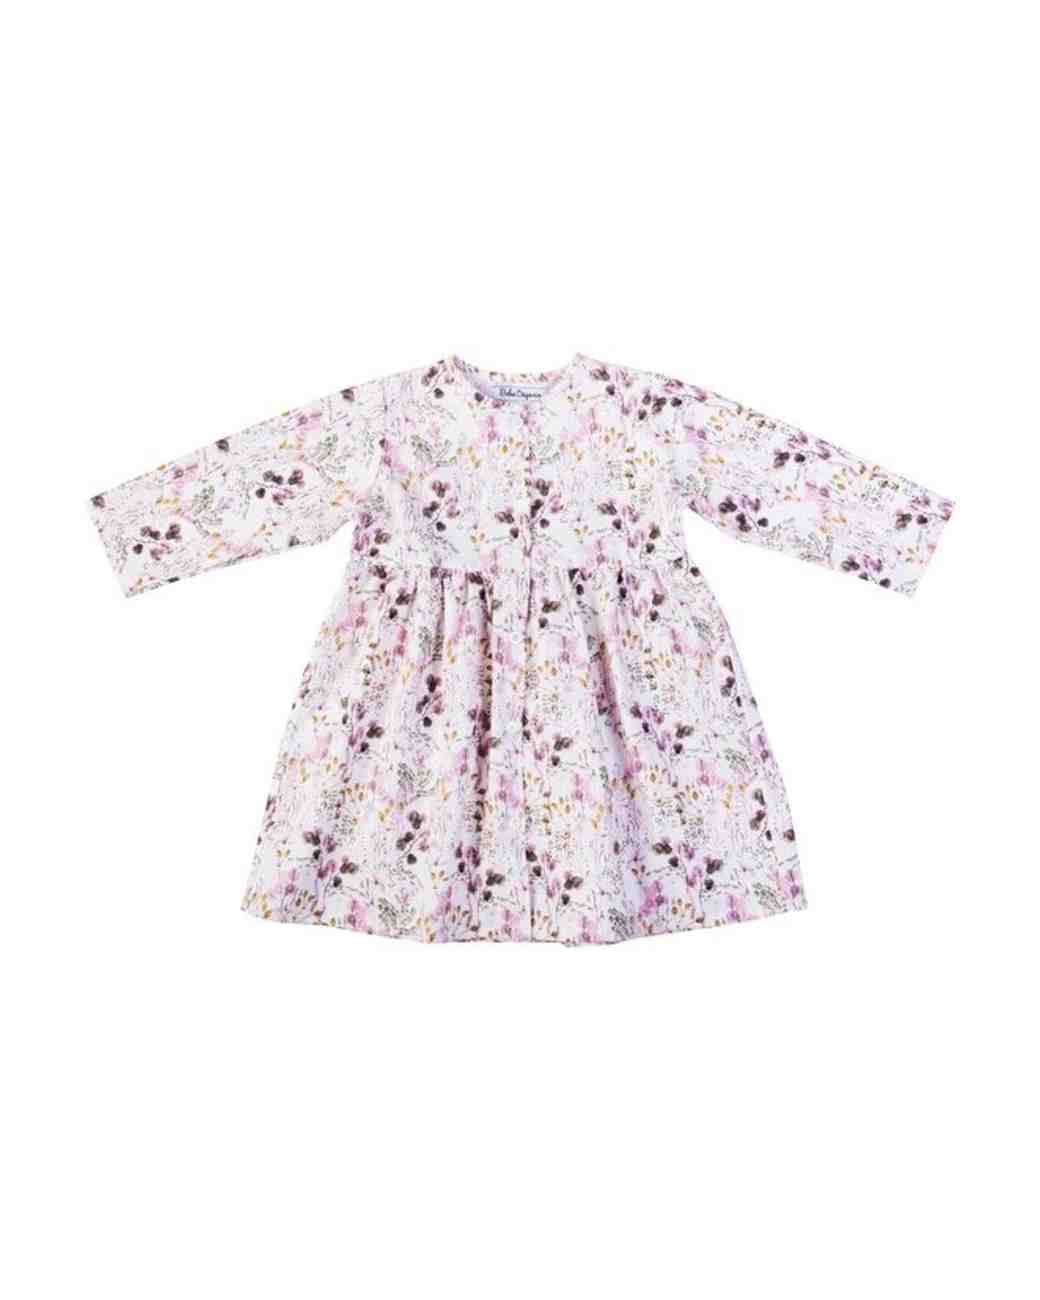 Bebe Organic Pale Purple Floral Flower Girl Dress